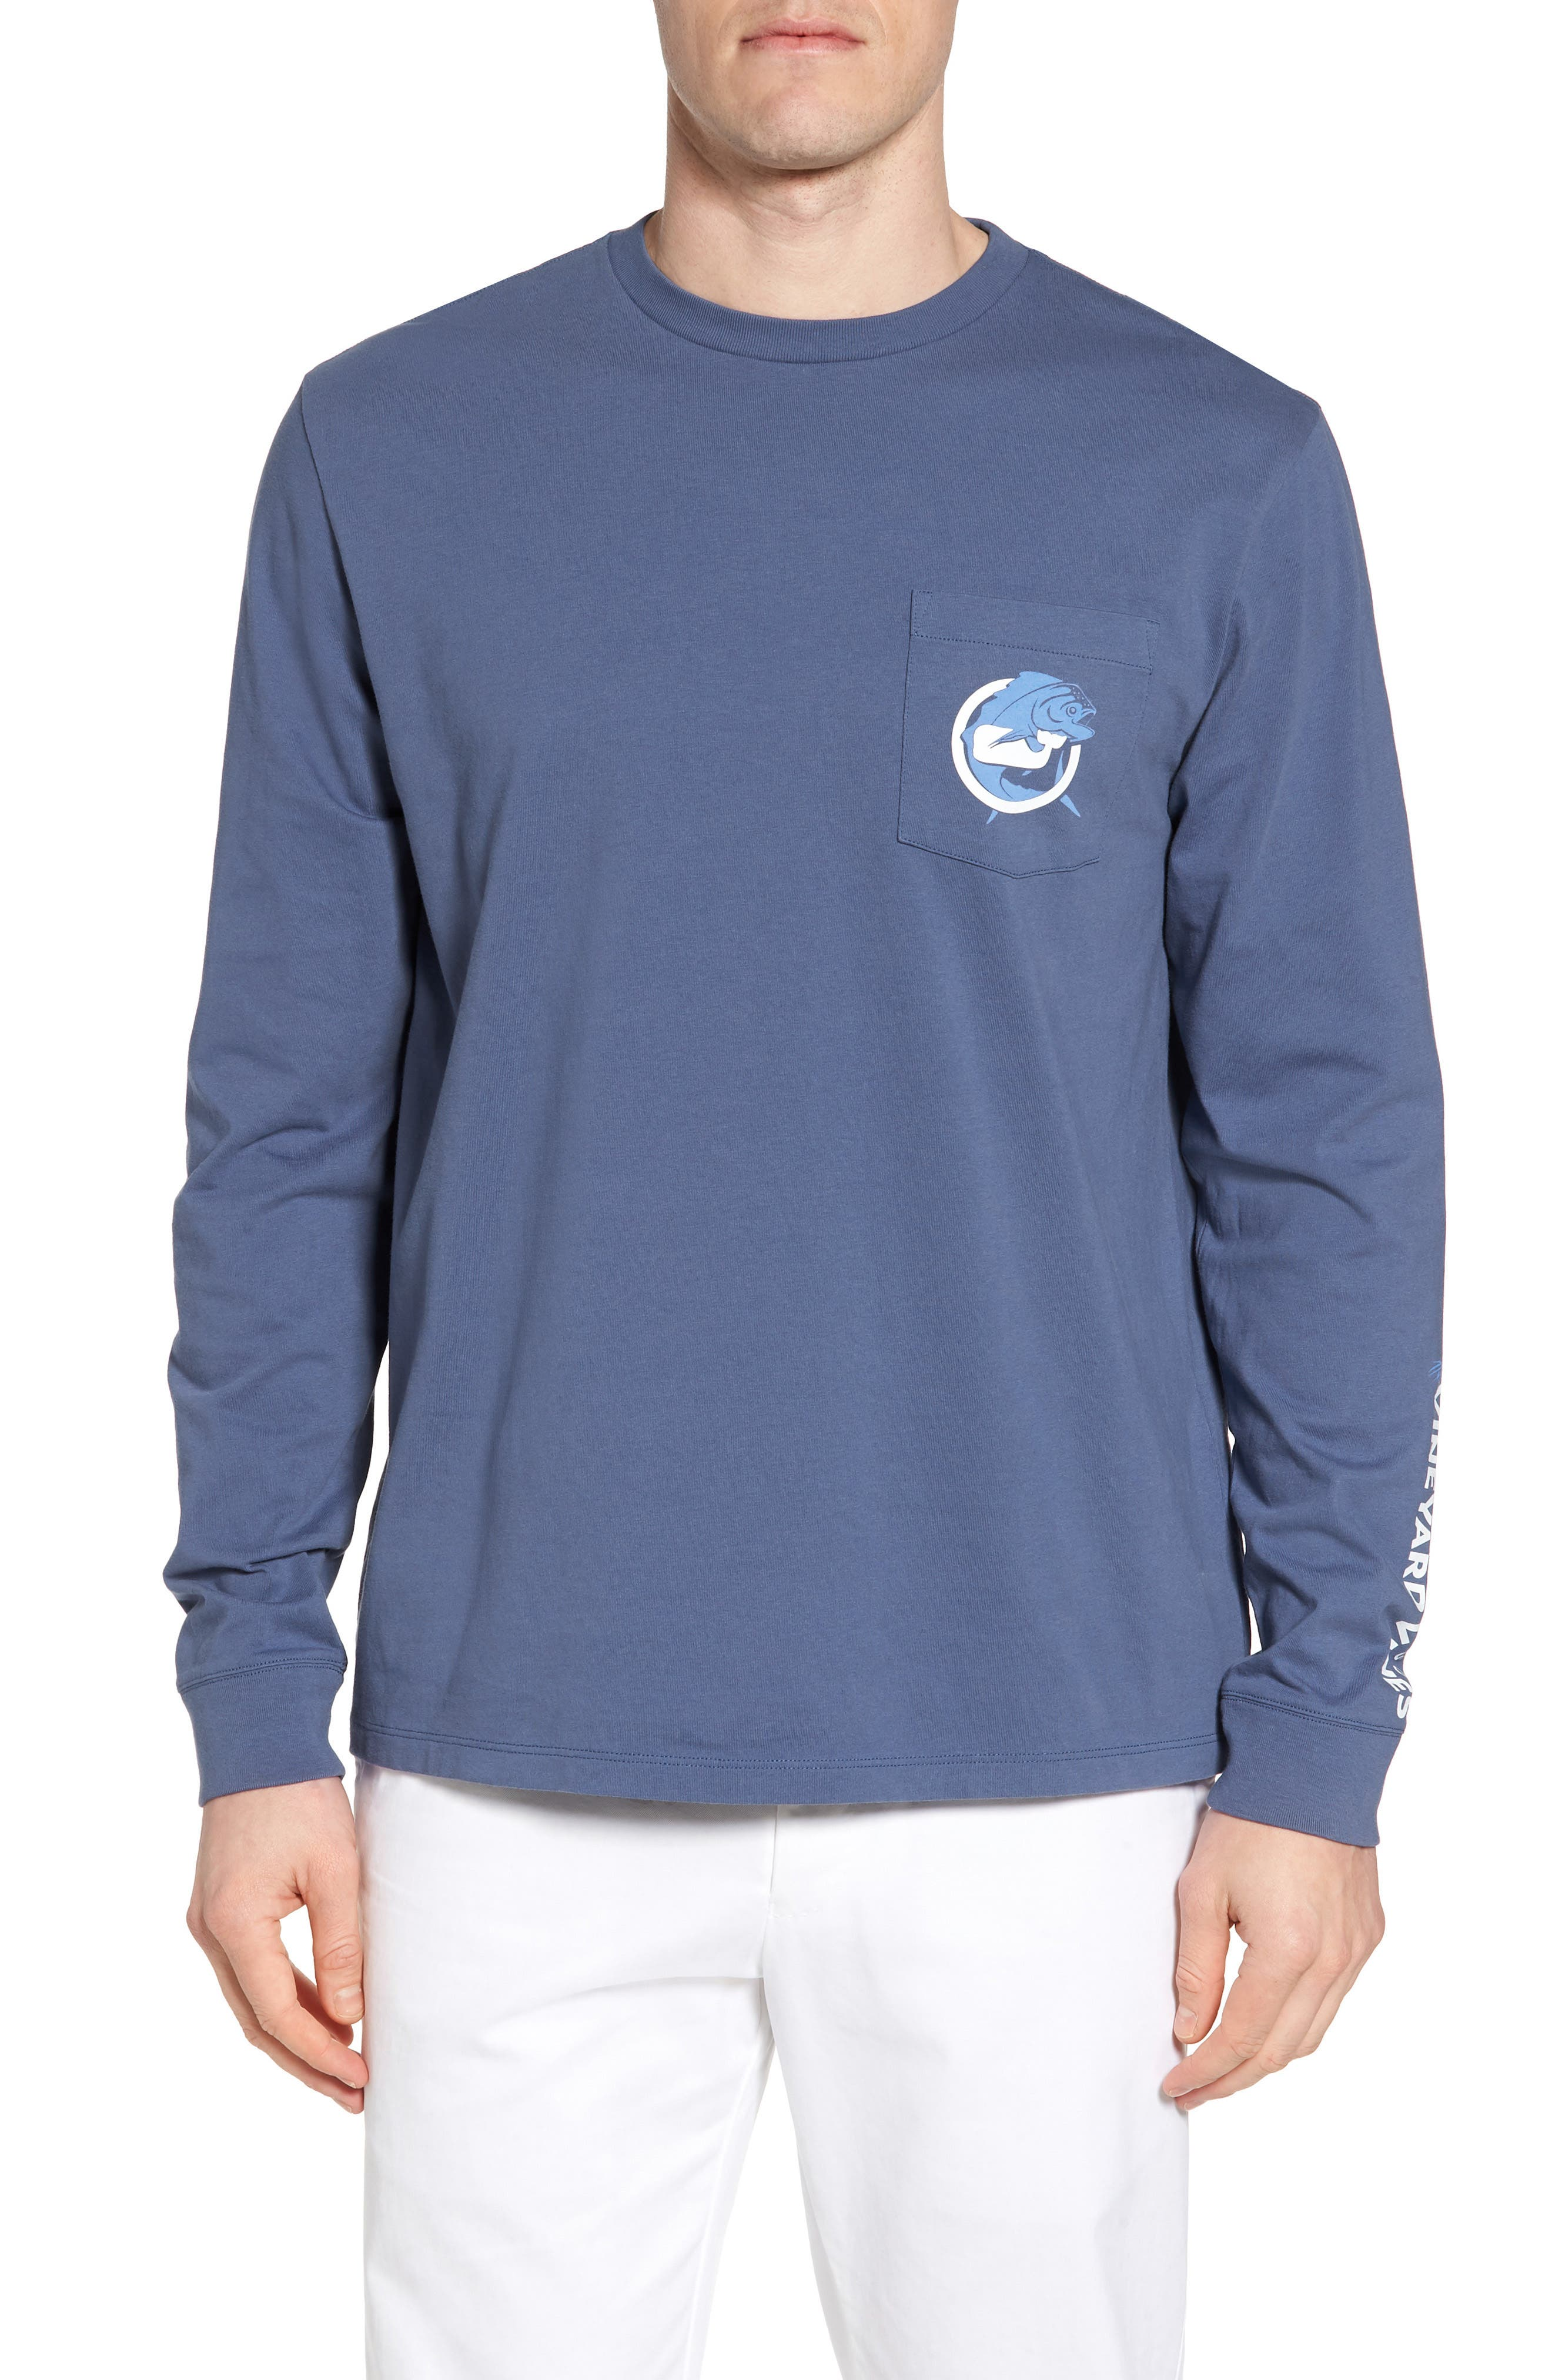 Mahi Long Sleeve T-Shirt,                             Main thumbnail 1, color,                             461